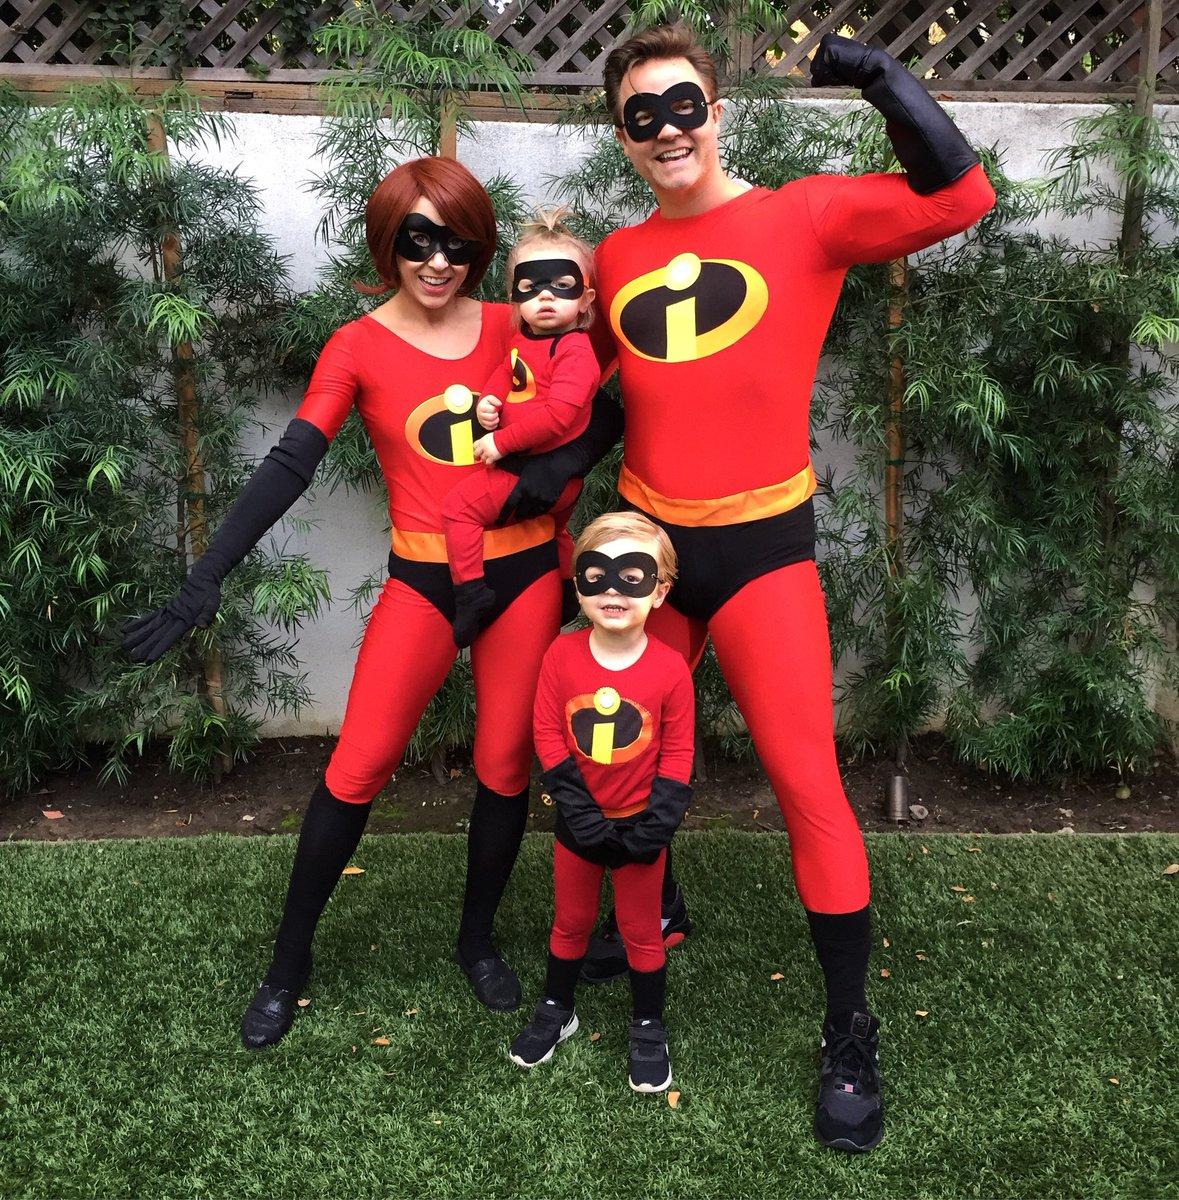 The Incredibles. Super rare theme this year, folks. #HappyHalloween  #WeLeftVioletAtHome https://t.co/xSEjPntch1